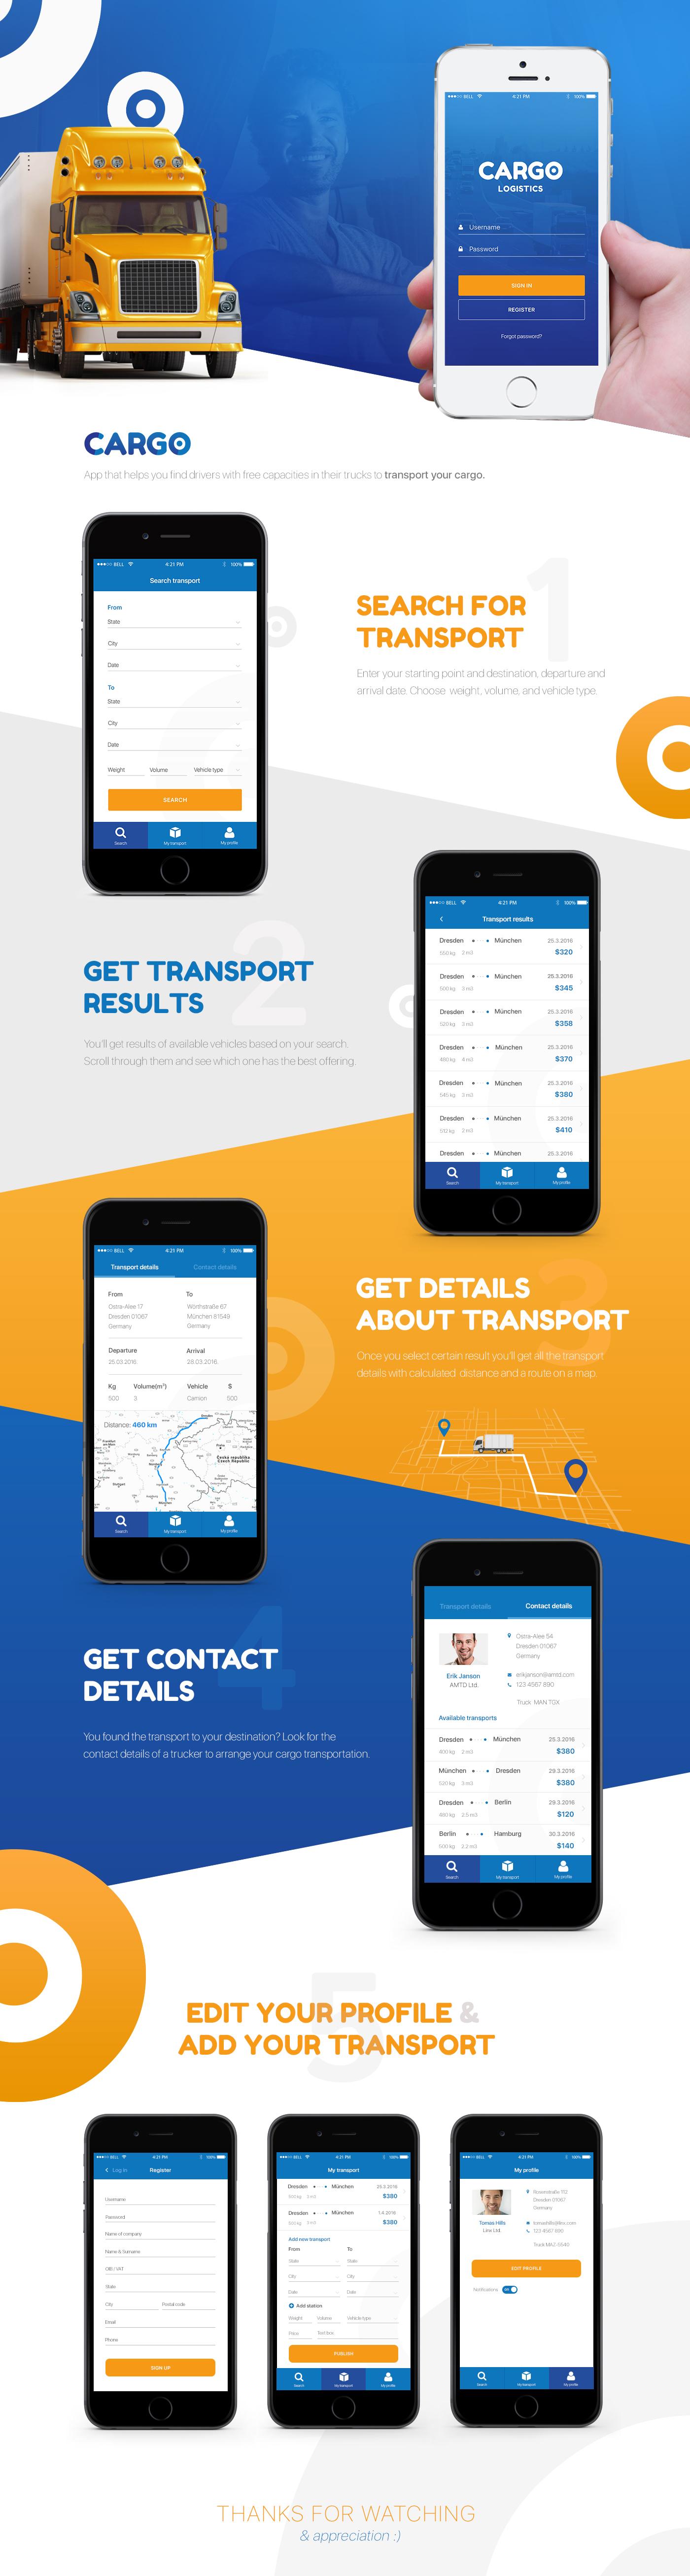 Pin on Transportation dashboard UI design inspirations